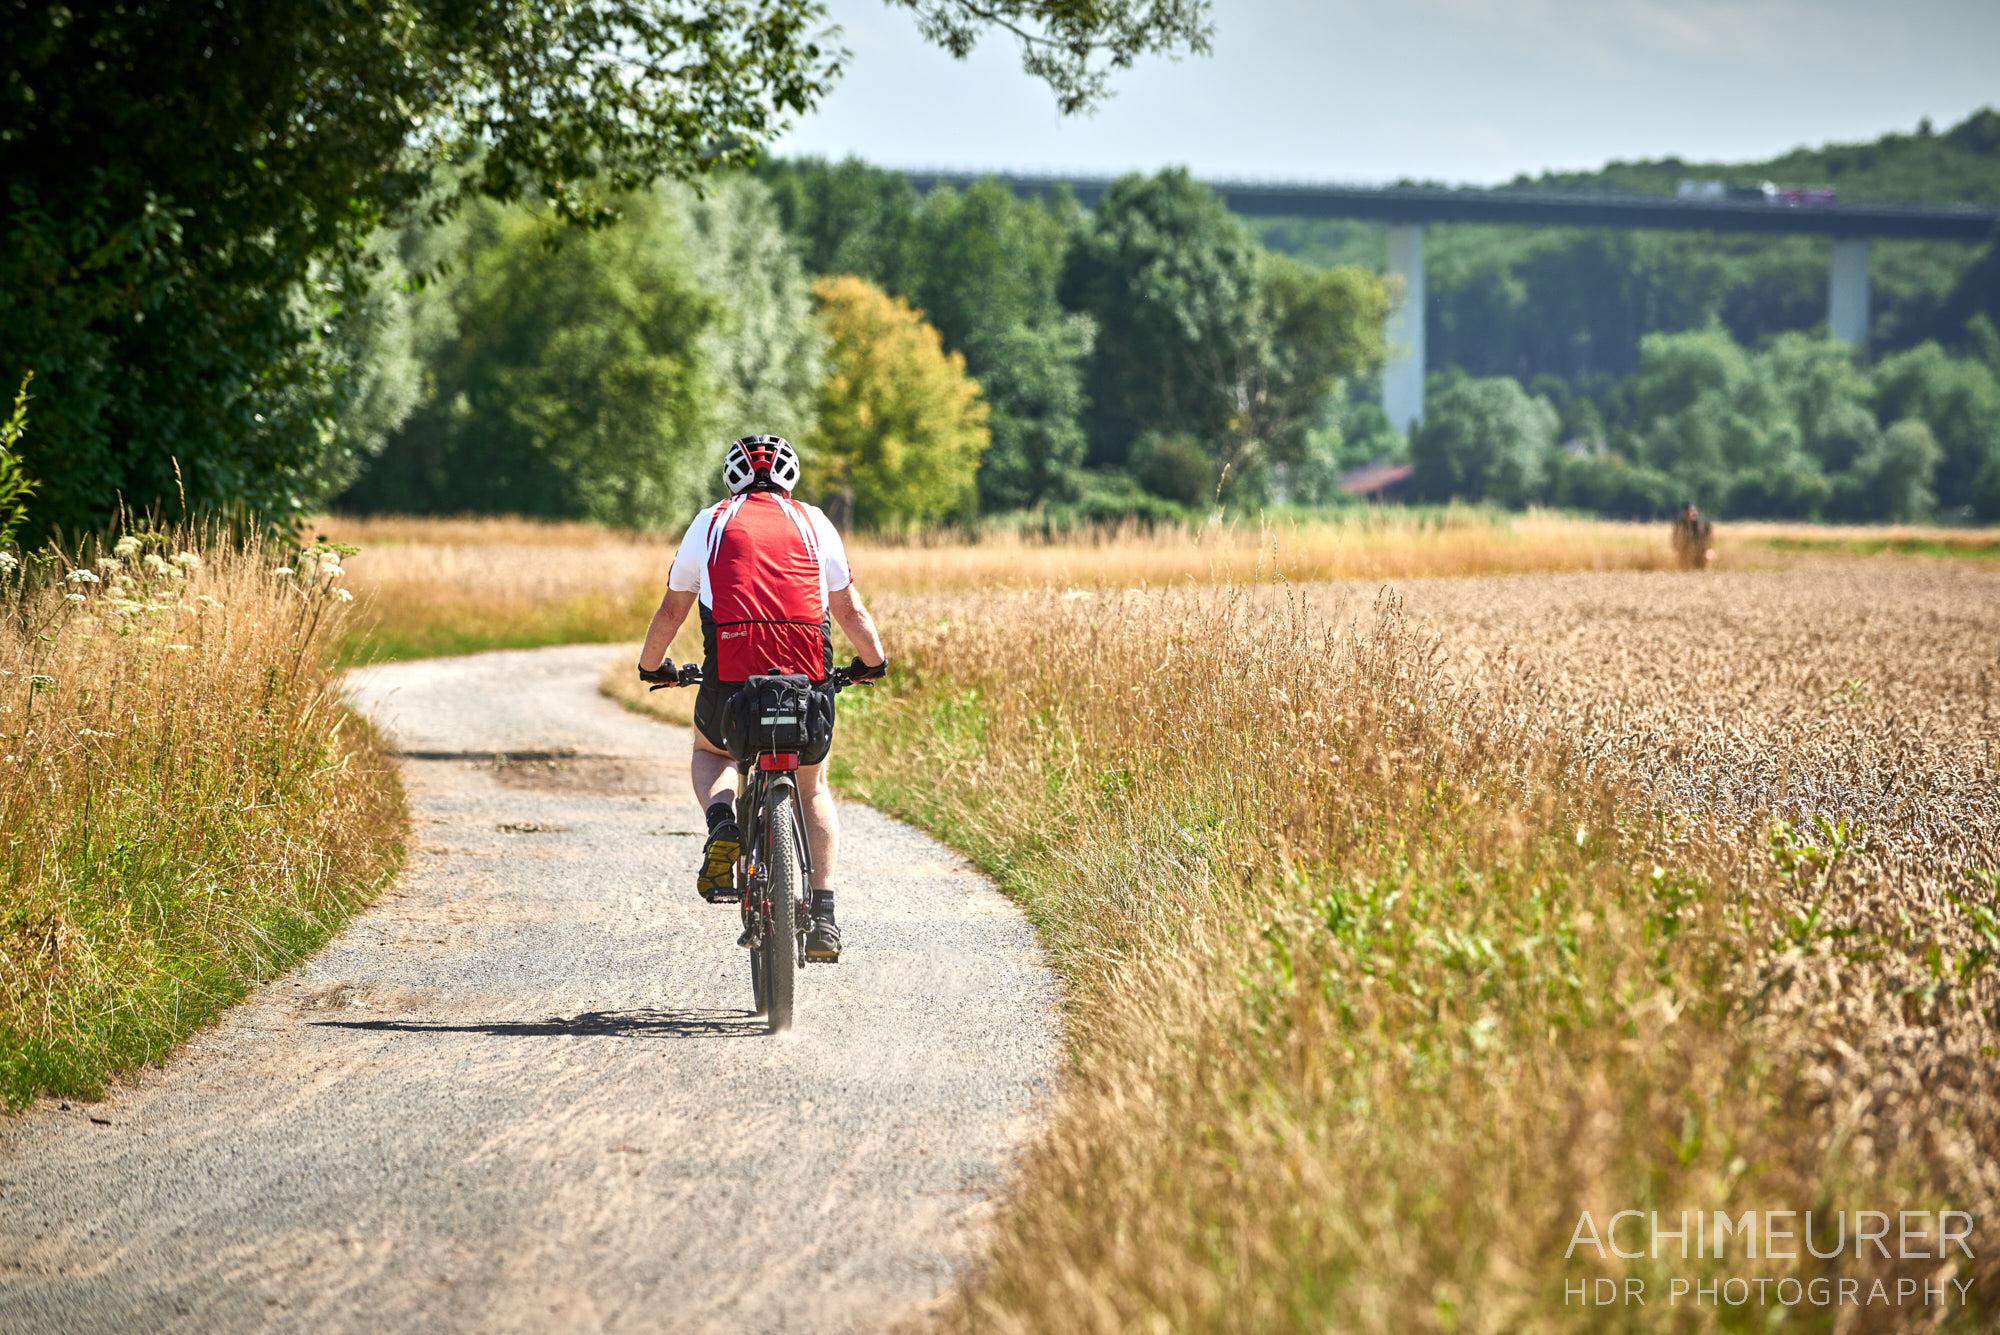 Fahrradtour Mülheim - Kettwig - Mülheim a.d. Ruhr, Ruhrgebiet, NRW by Array.